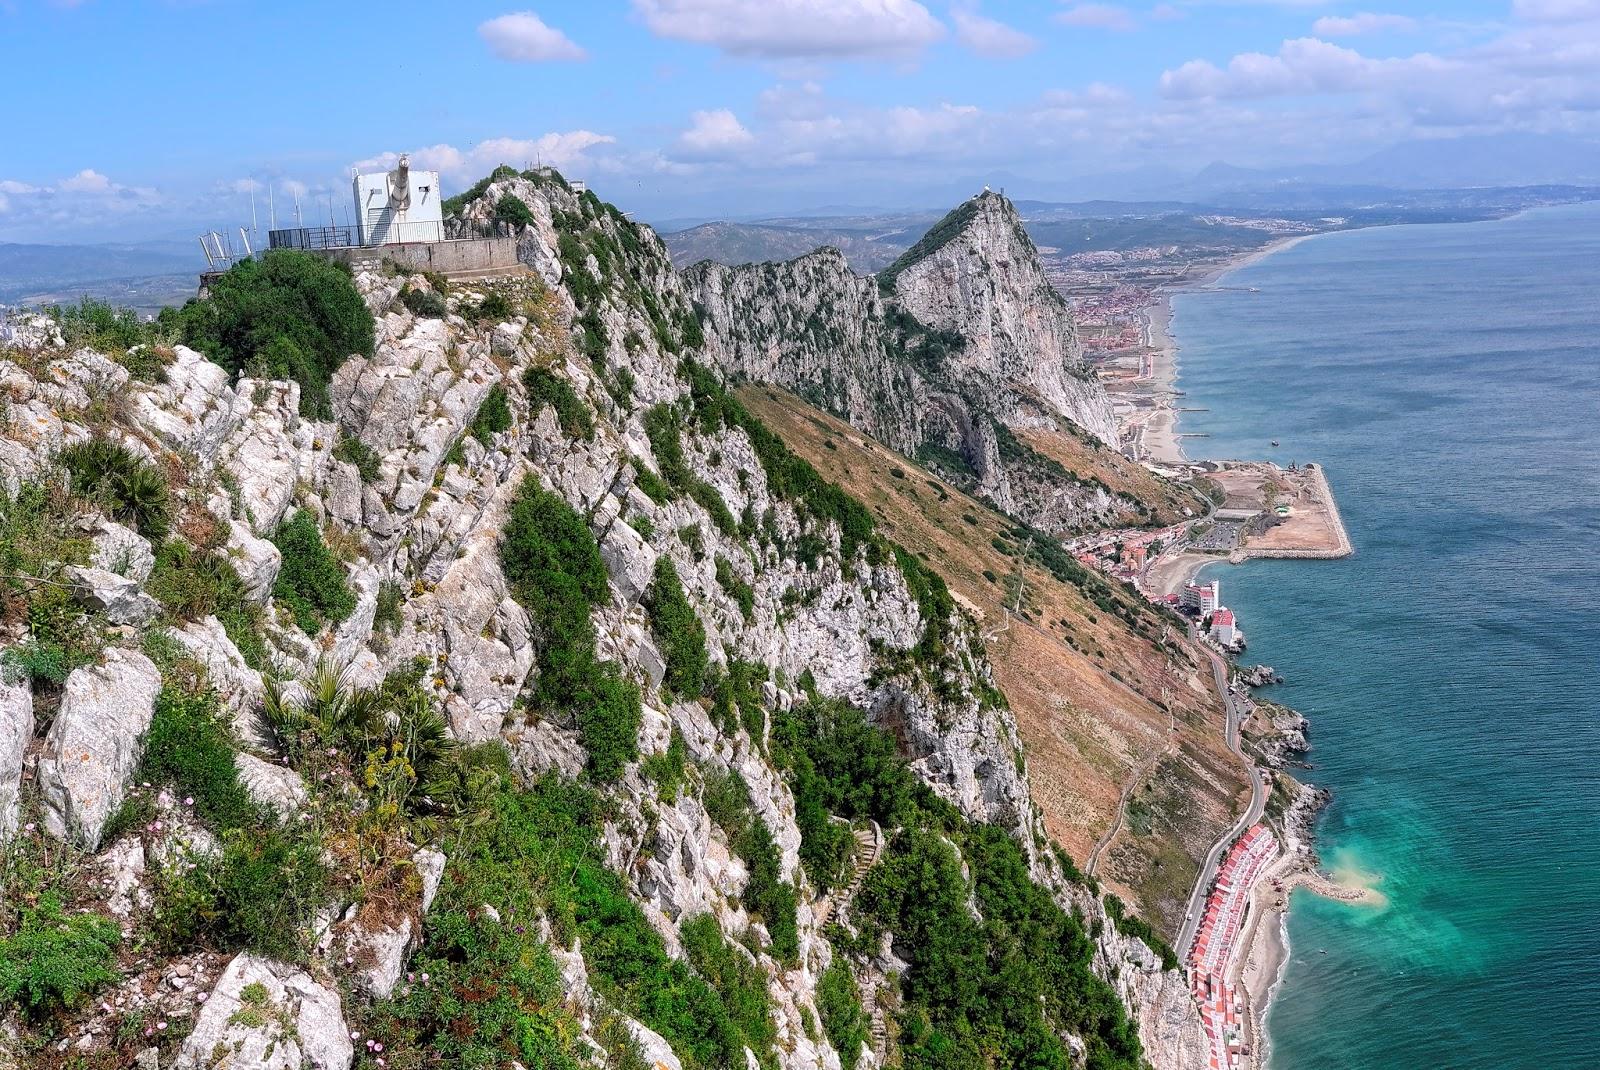 Gibilterra - upper rock nature reserve